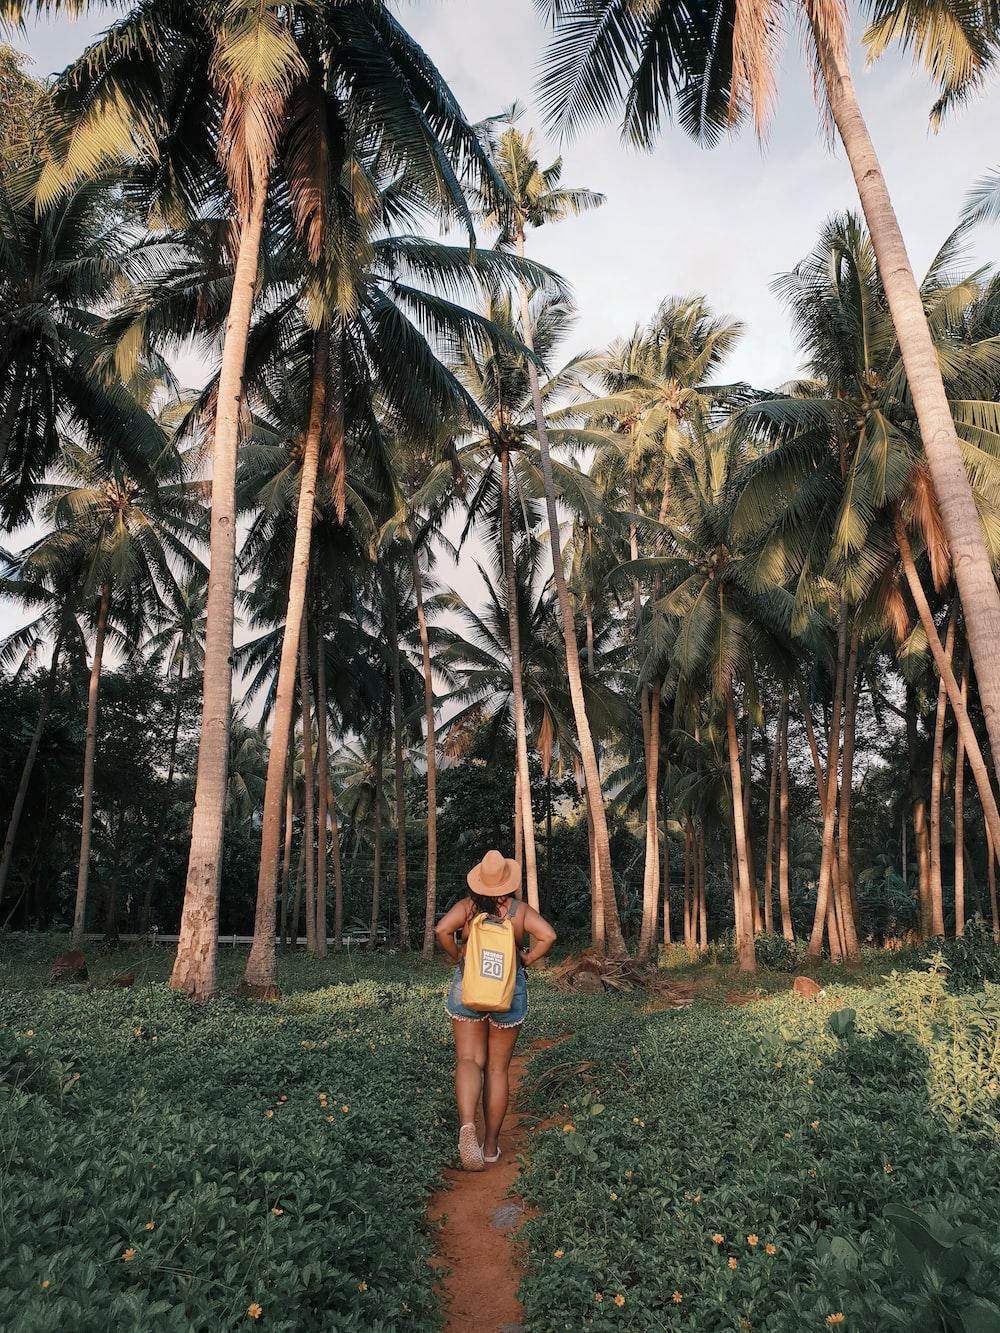 person walking in field near tall palm trees